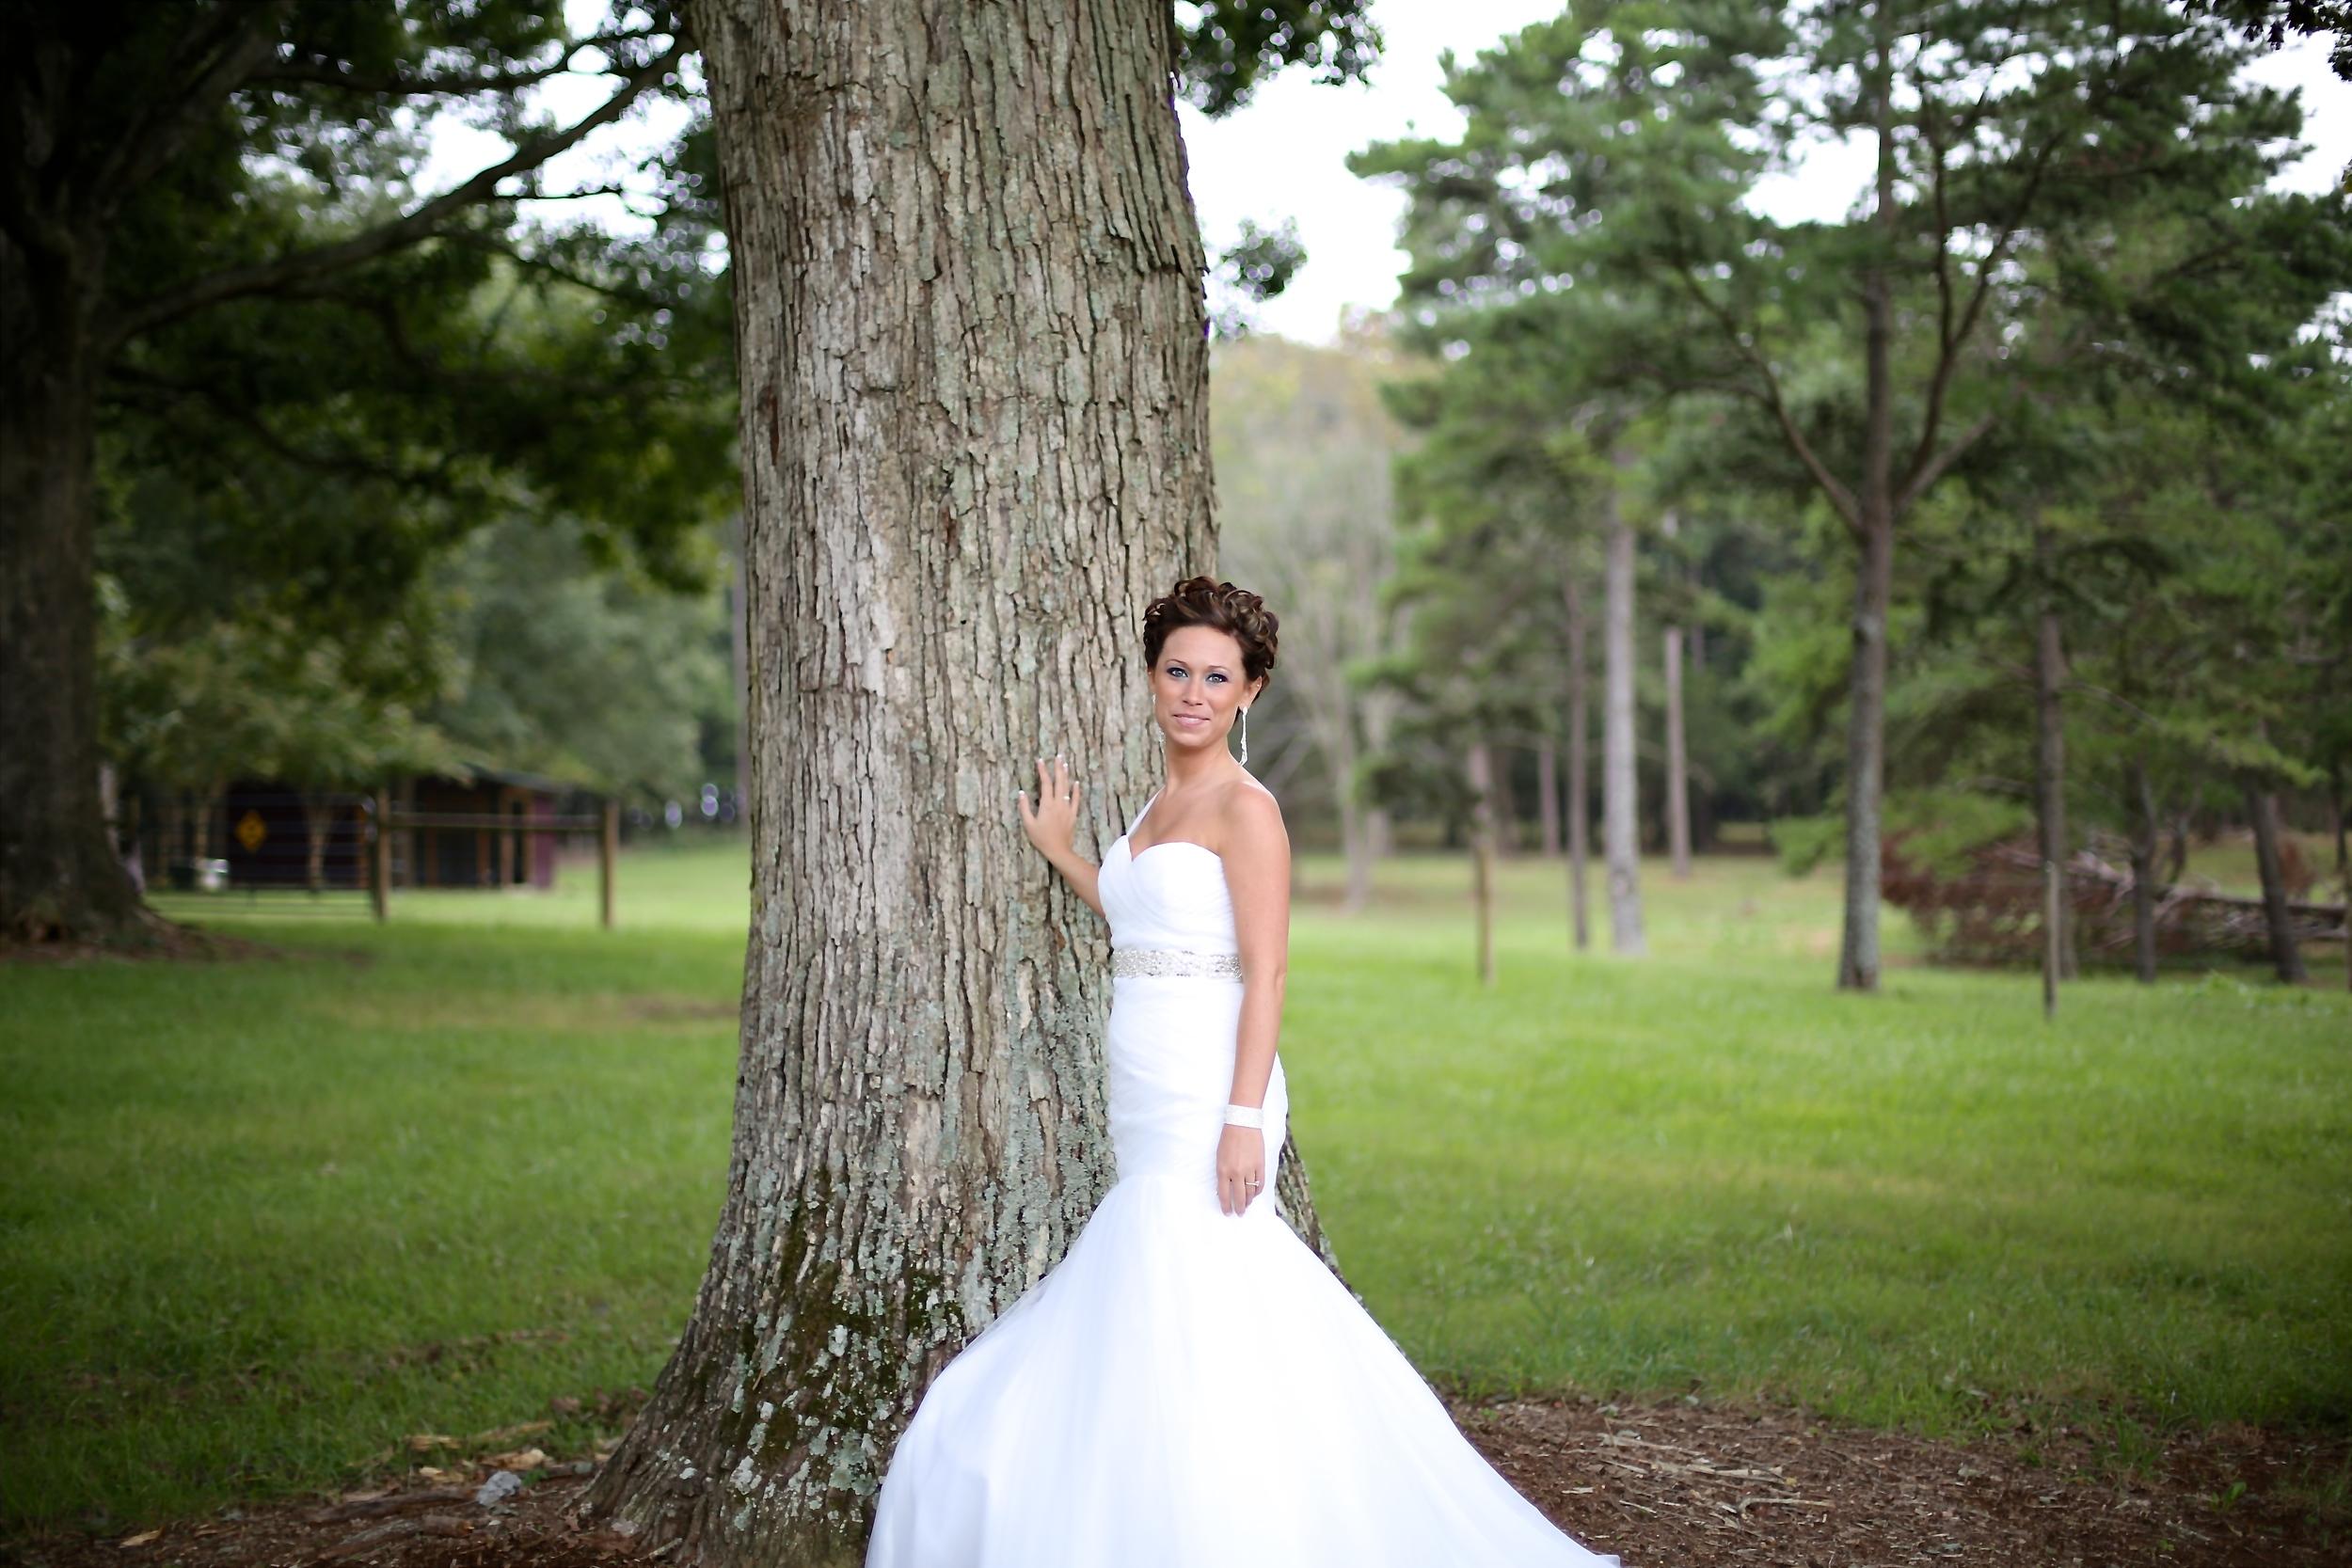 Joanna bridal shoot 18